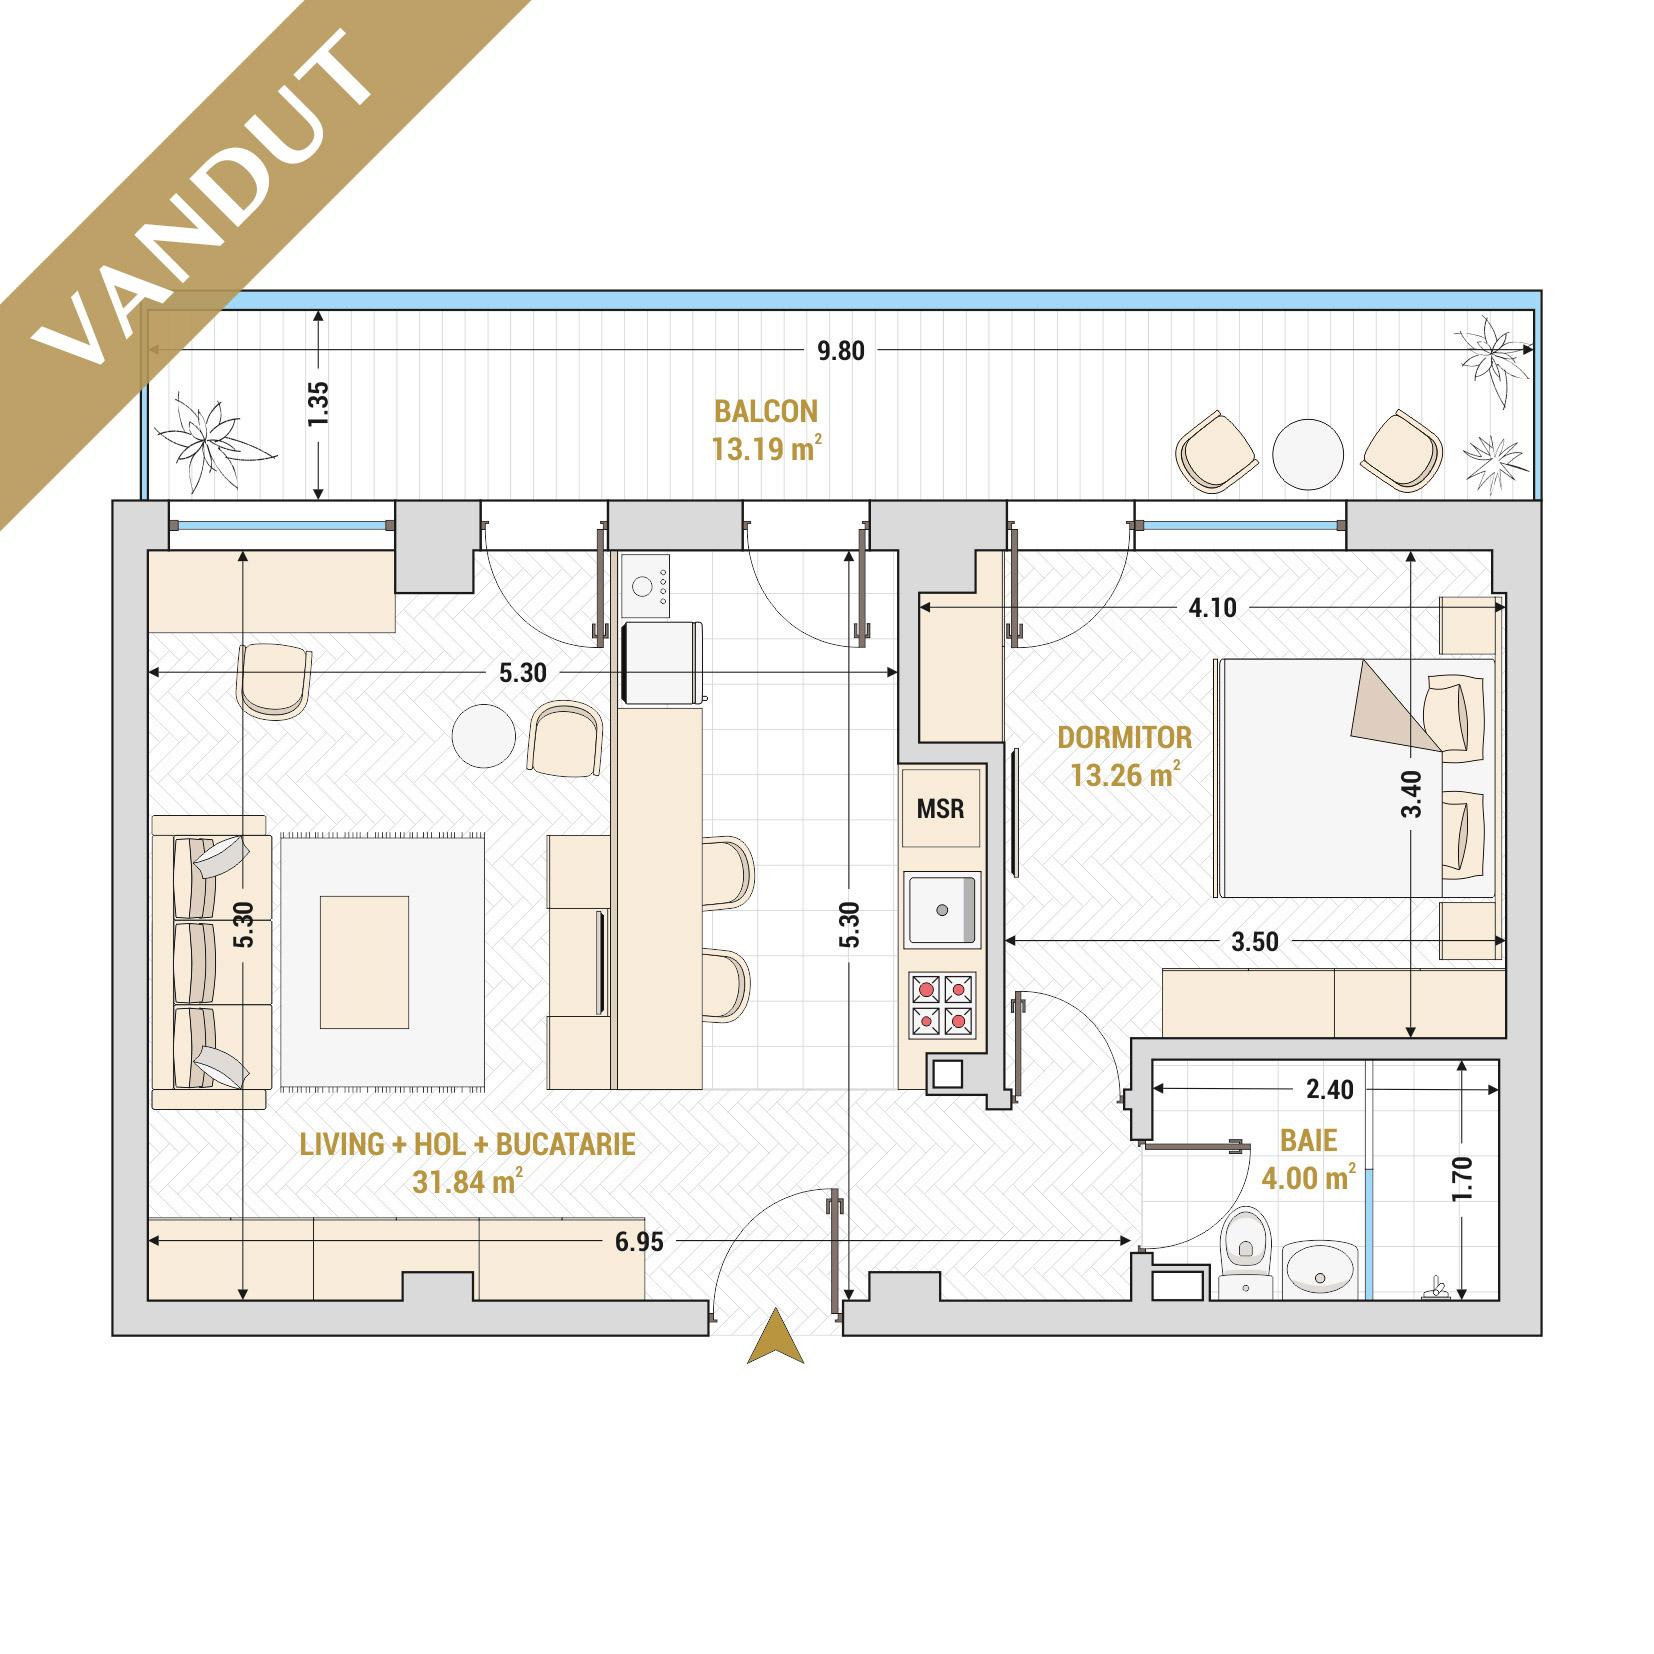 Apartamente cu 2 camere de vanzare Bucuresti - Catedral Residence - Marriott, Piata Unirii, 13 Septembrie, Izvor - Tip 4 - T1A